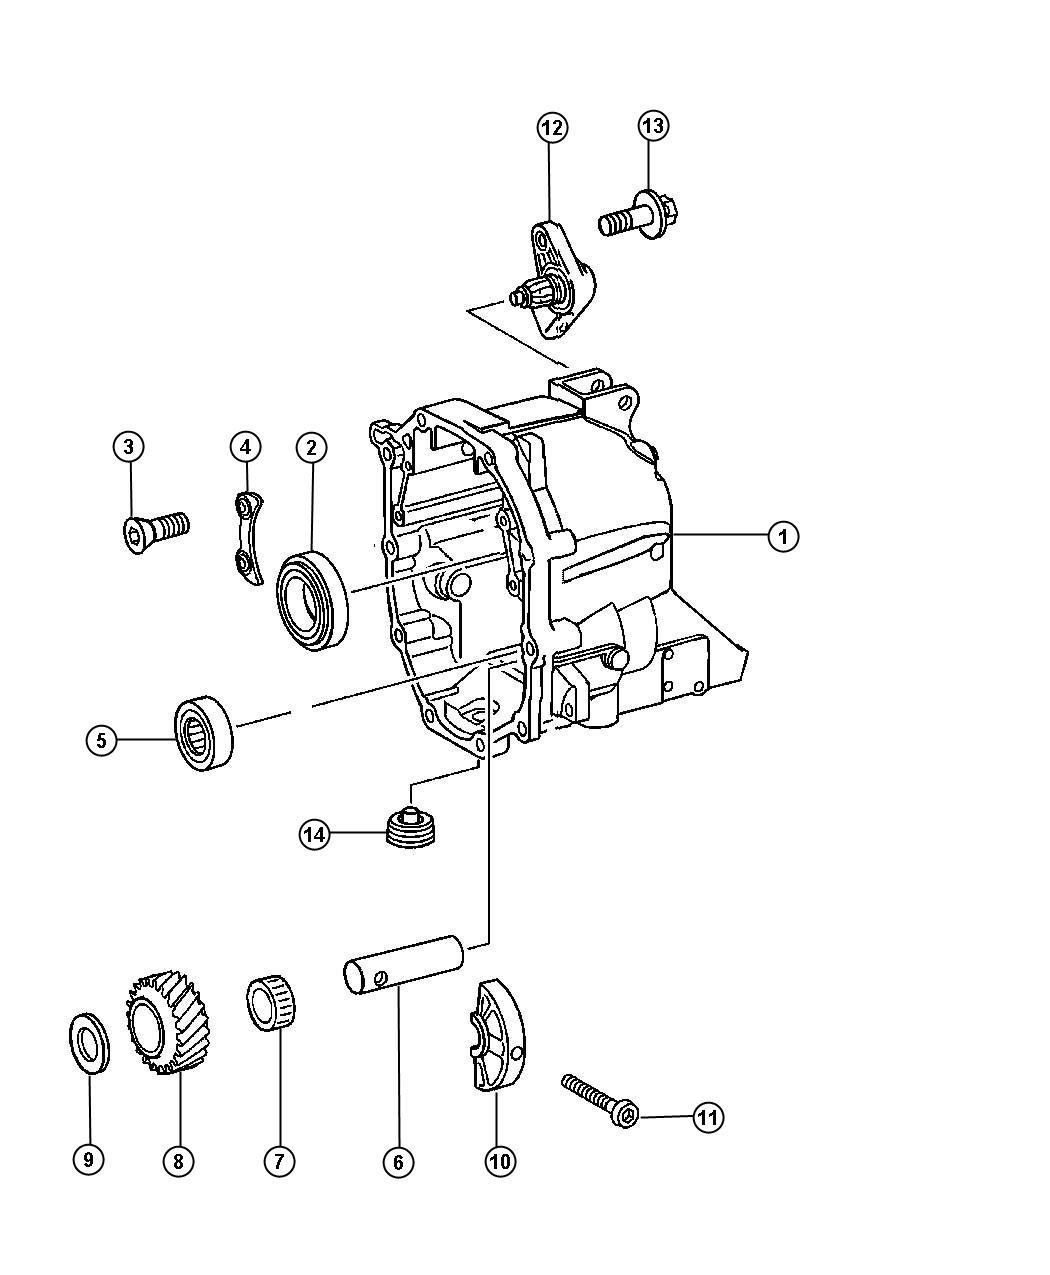 Jeep Wrangler Plug  Oil Drain  Case  Related  Rear